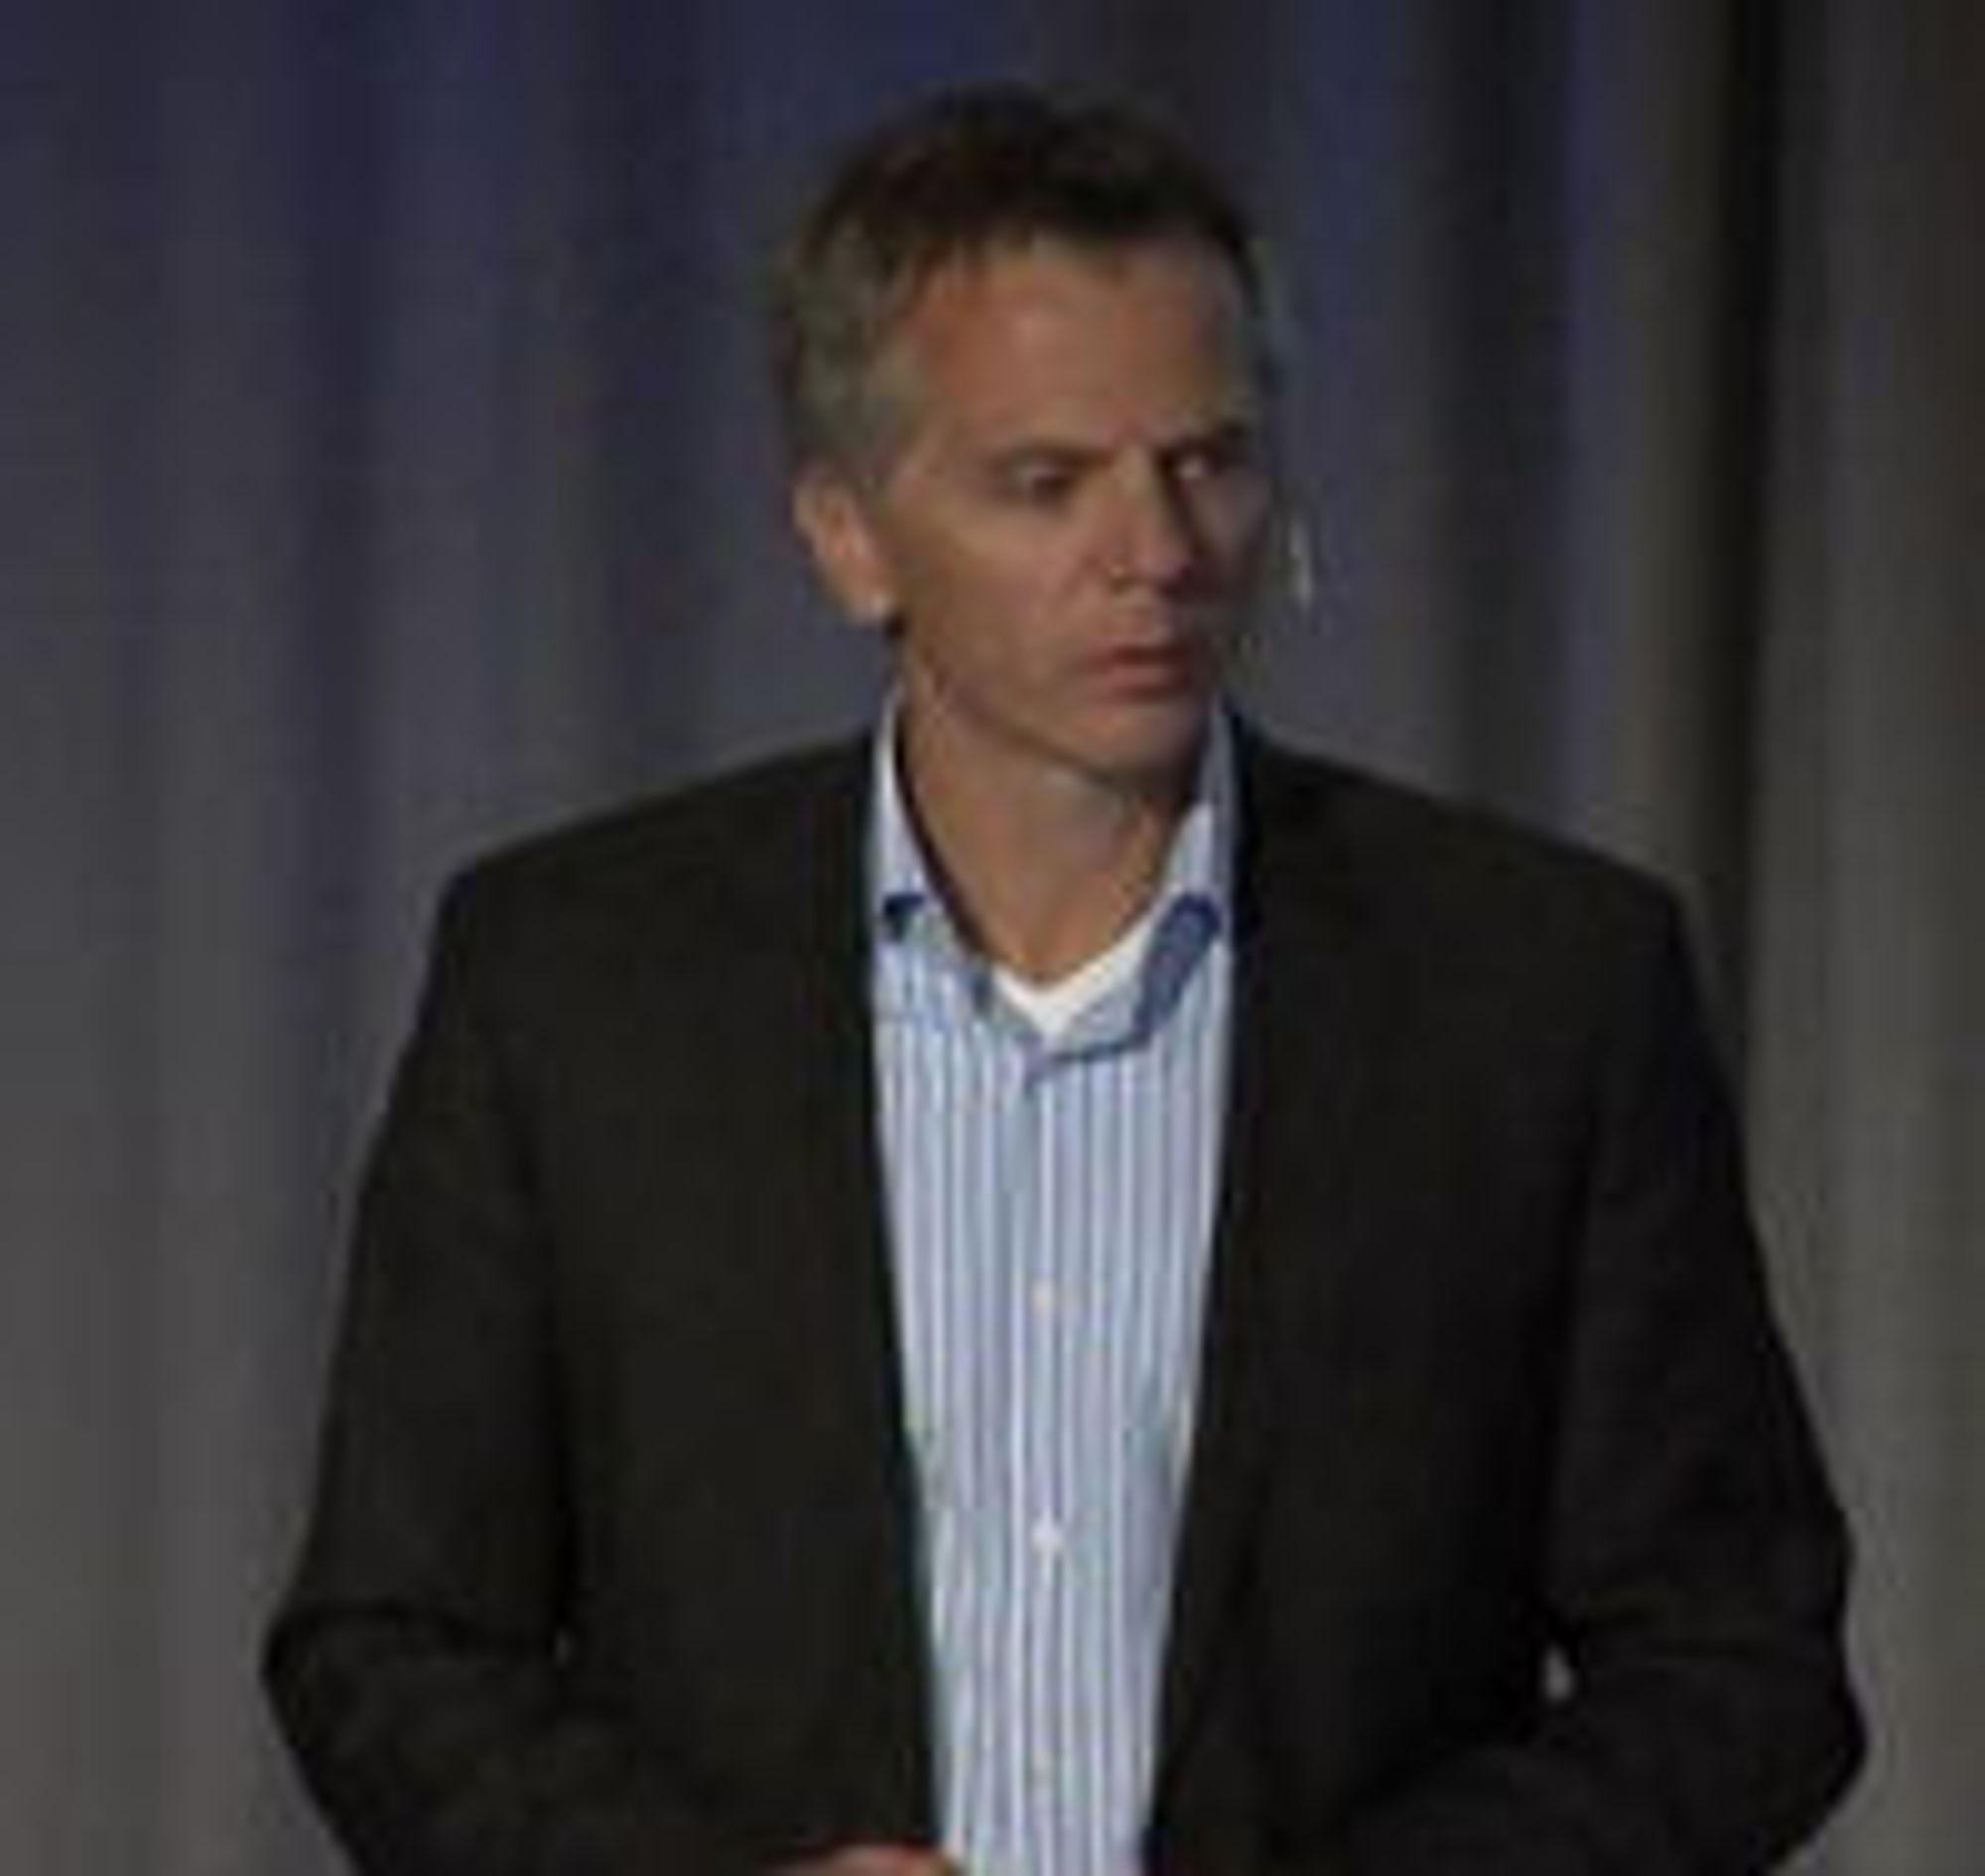 Ragnar Kårhus, leder for Telenor Norge, under pressemøtet torsdag.